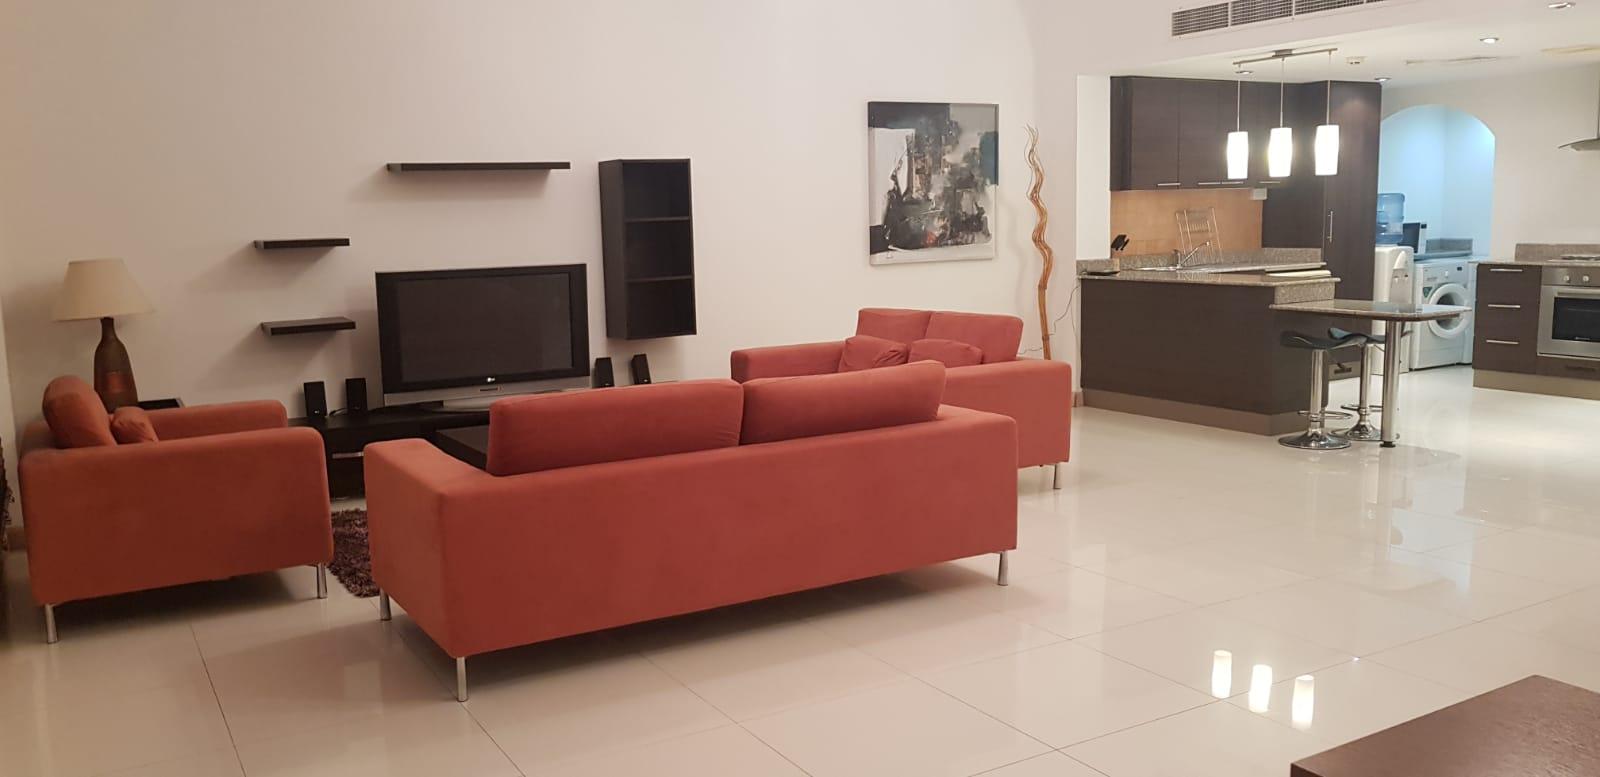 Impressive & Luxurious 2 BR Apartment in Adliya!